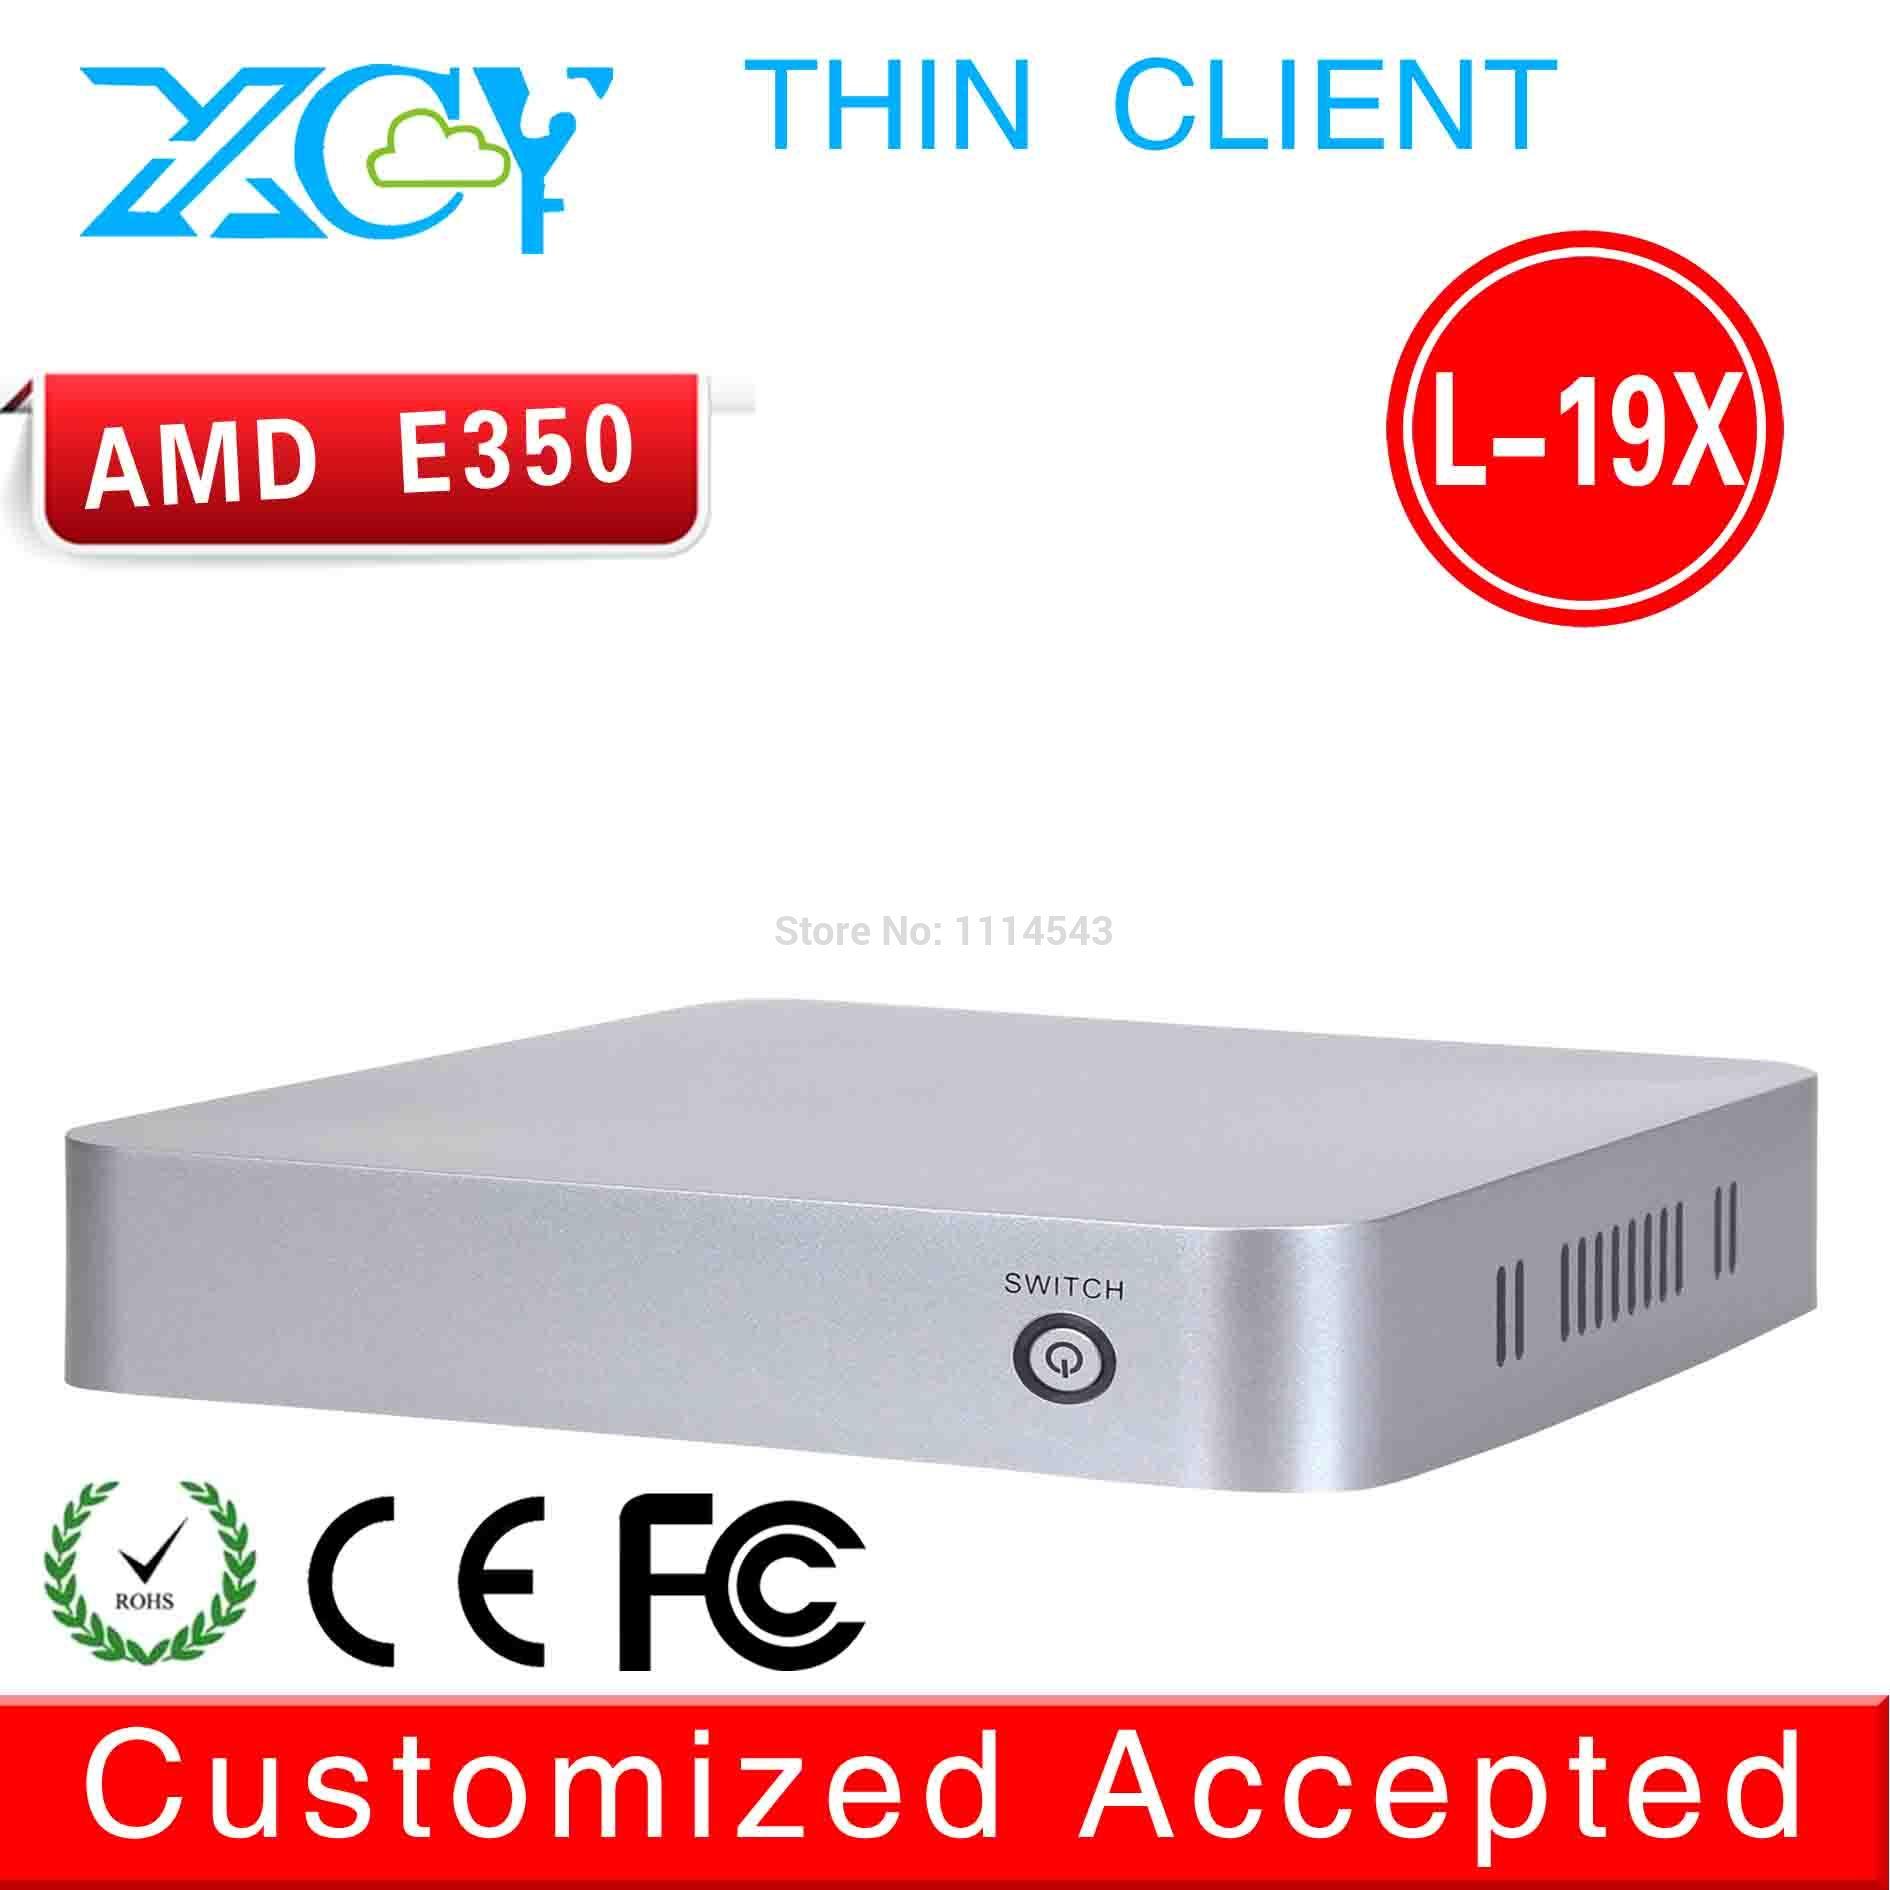 4g ram no ssd wifi E350 mini pc mini itx case htpc e350 mini computer support wireless keyboard mouse wifi earphone(China (Mainland))